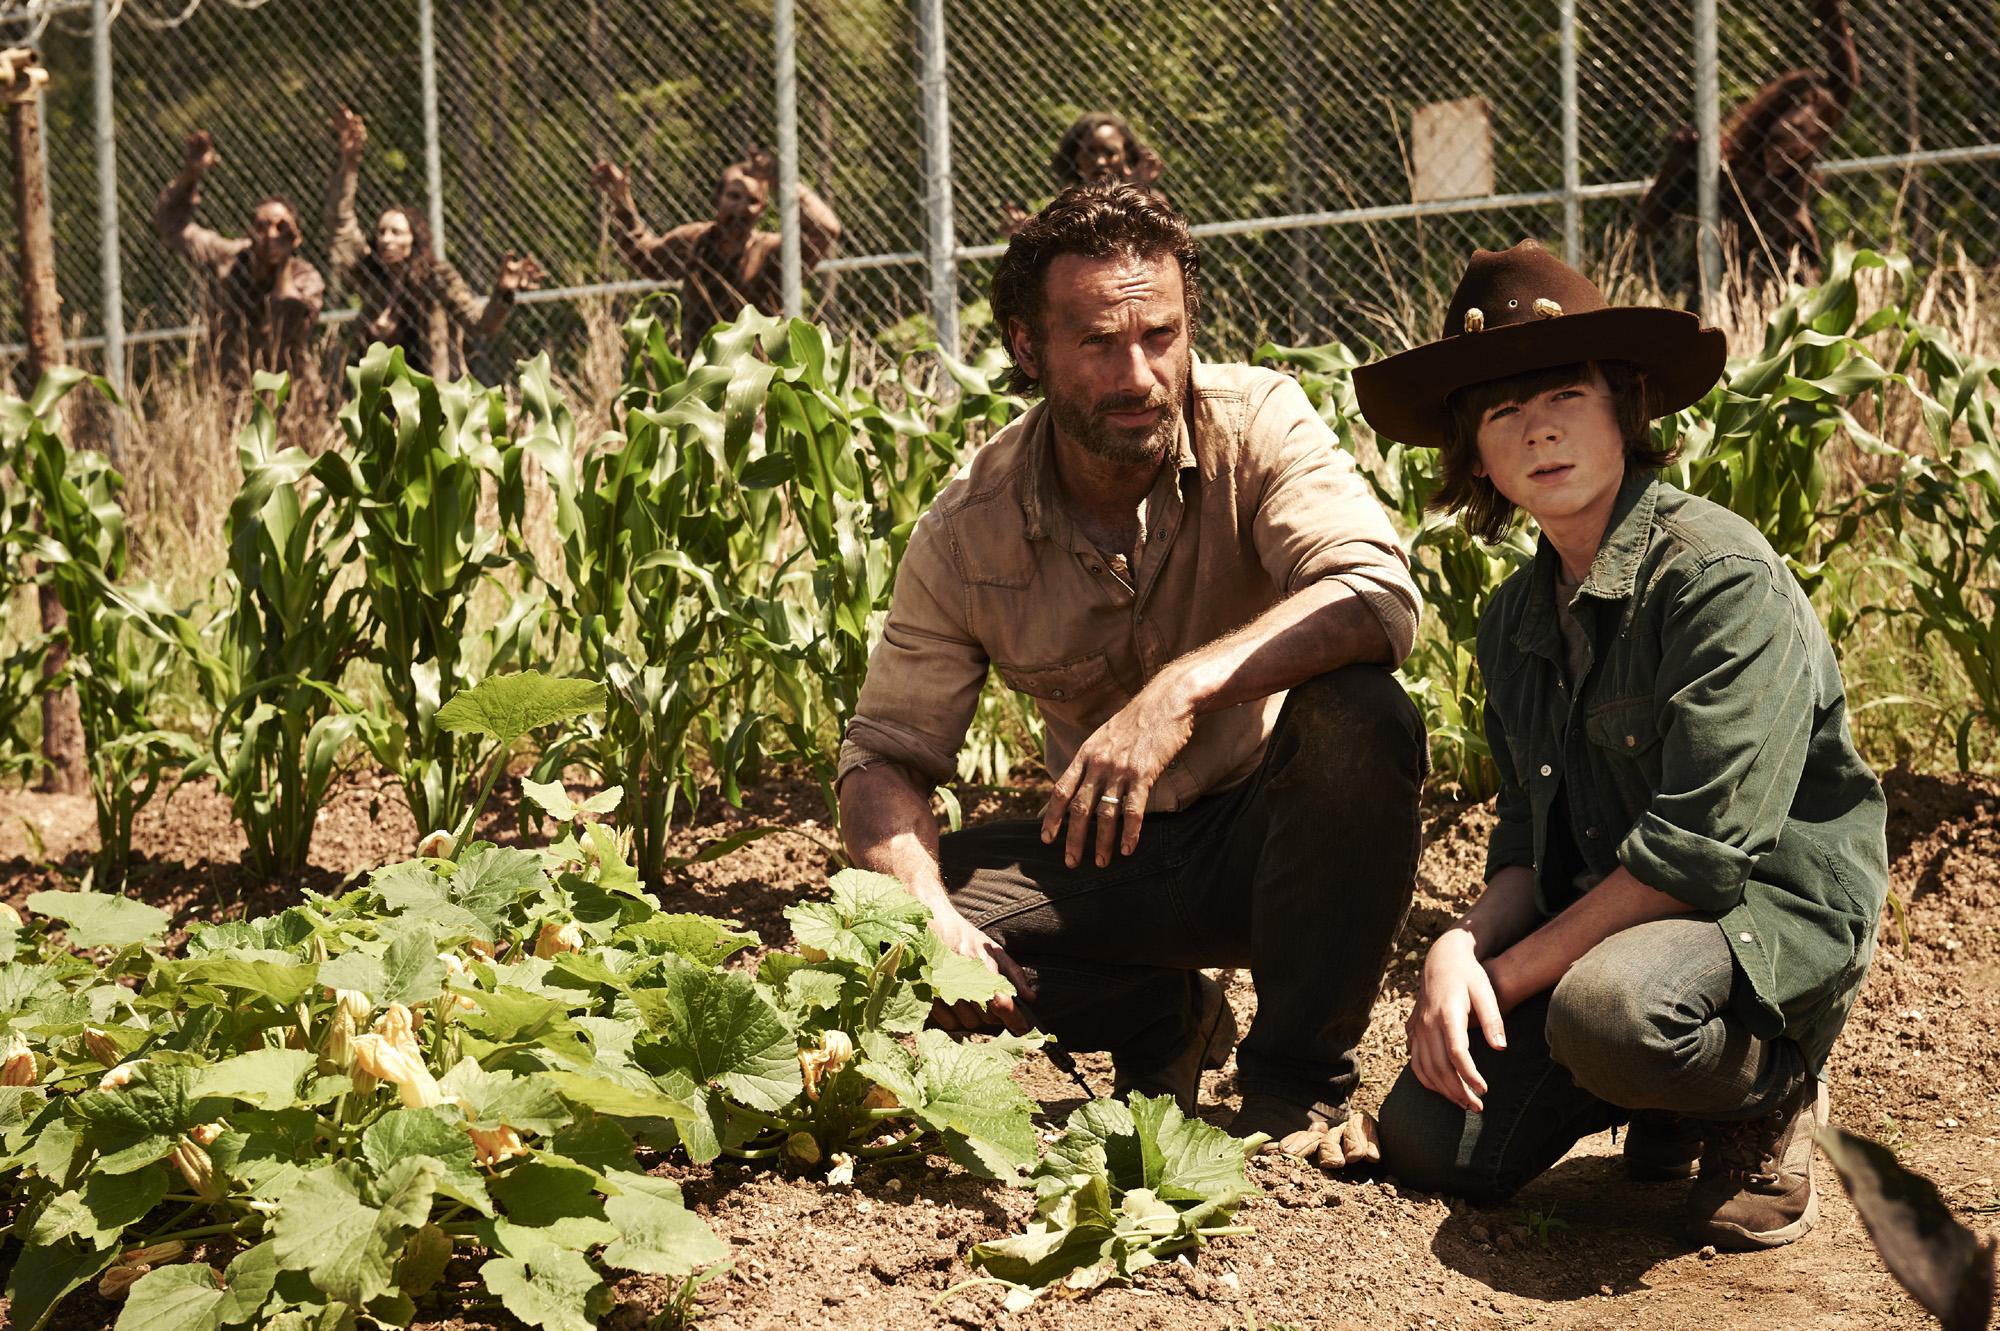 The Walking Dead: Season Four Cast and Episode Photos! | SciFi Stream